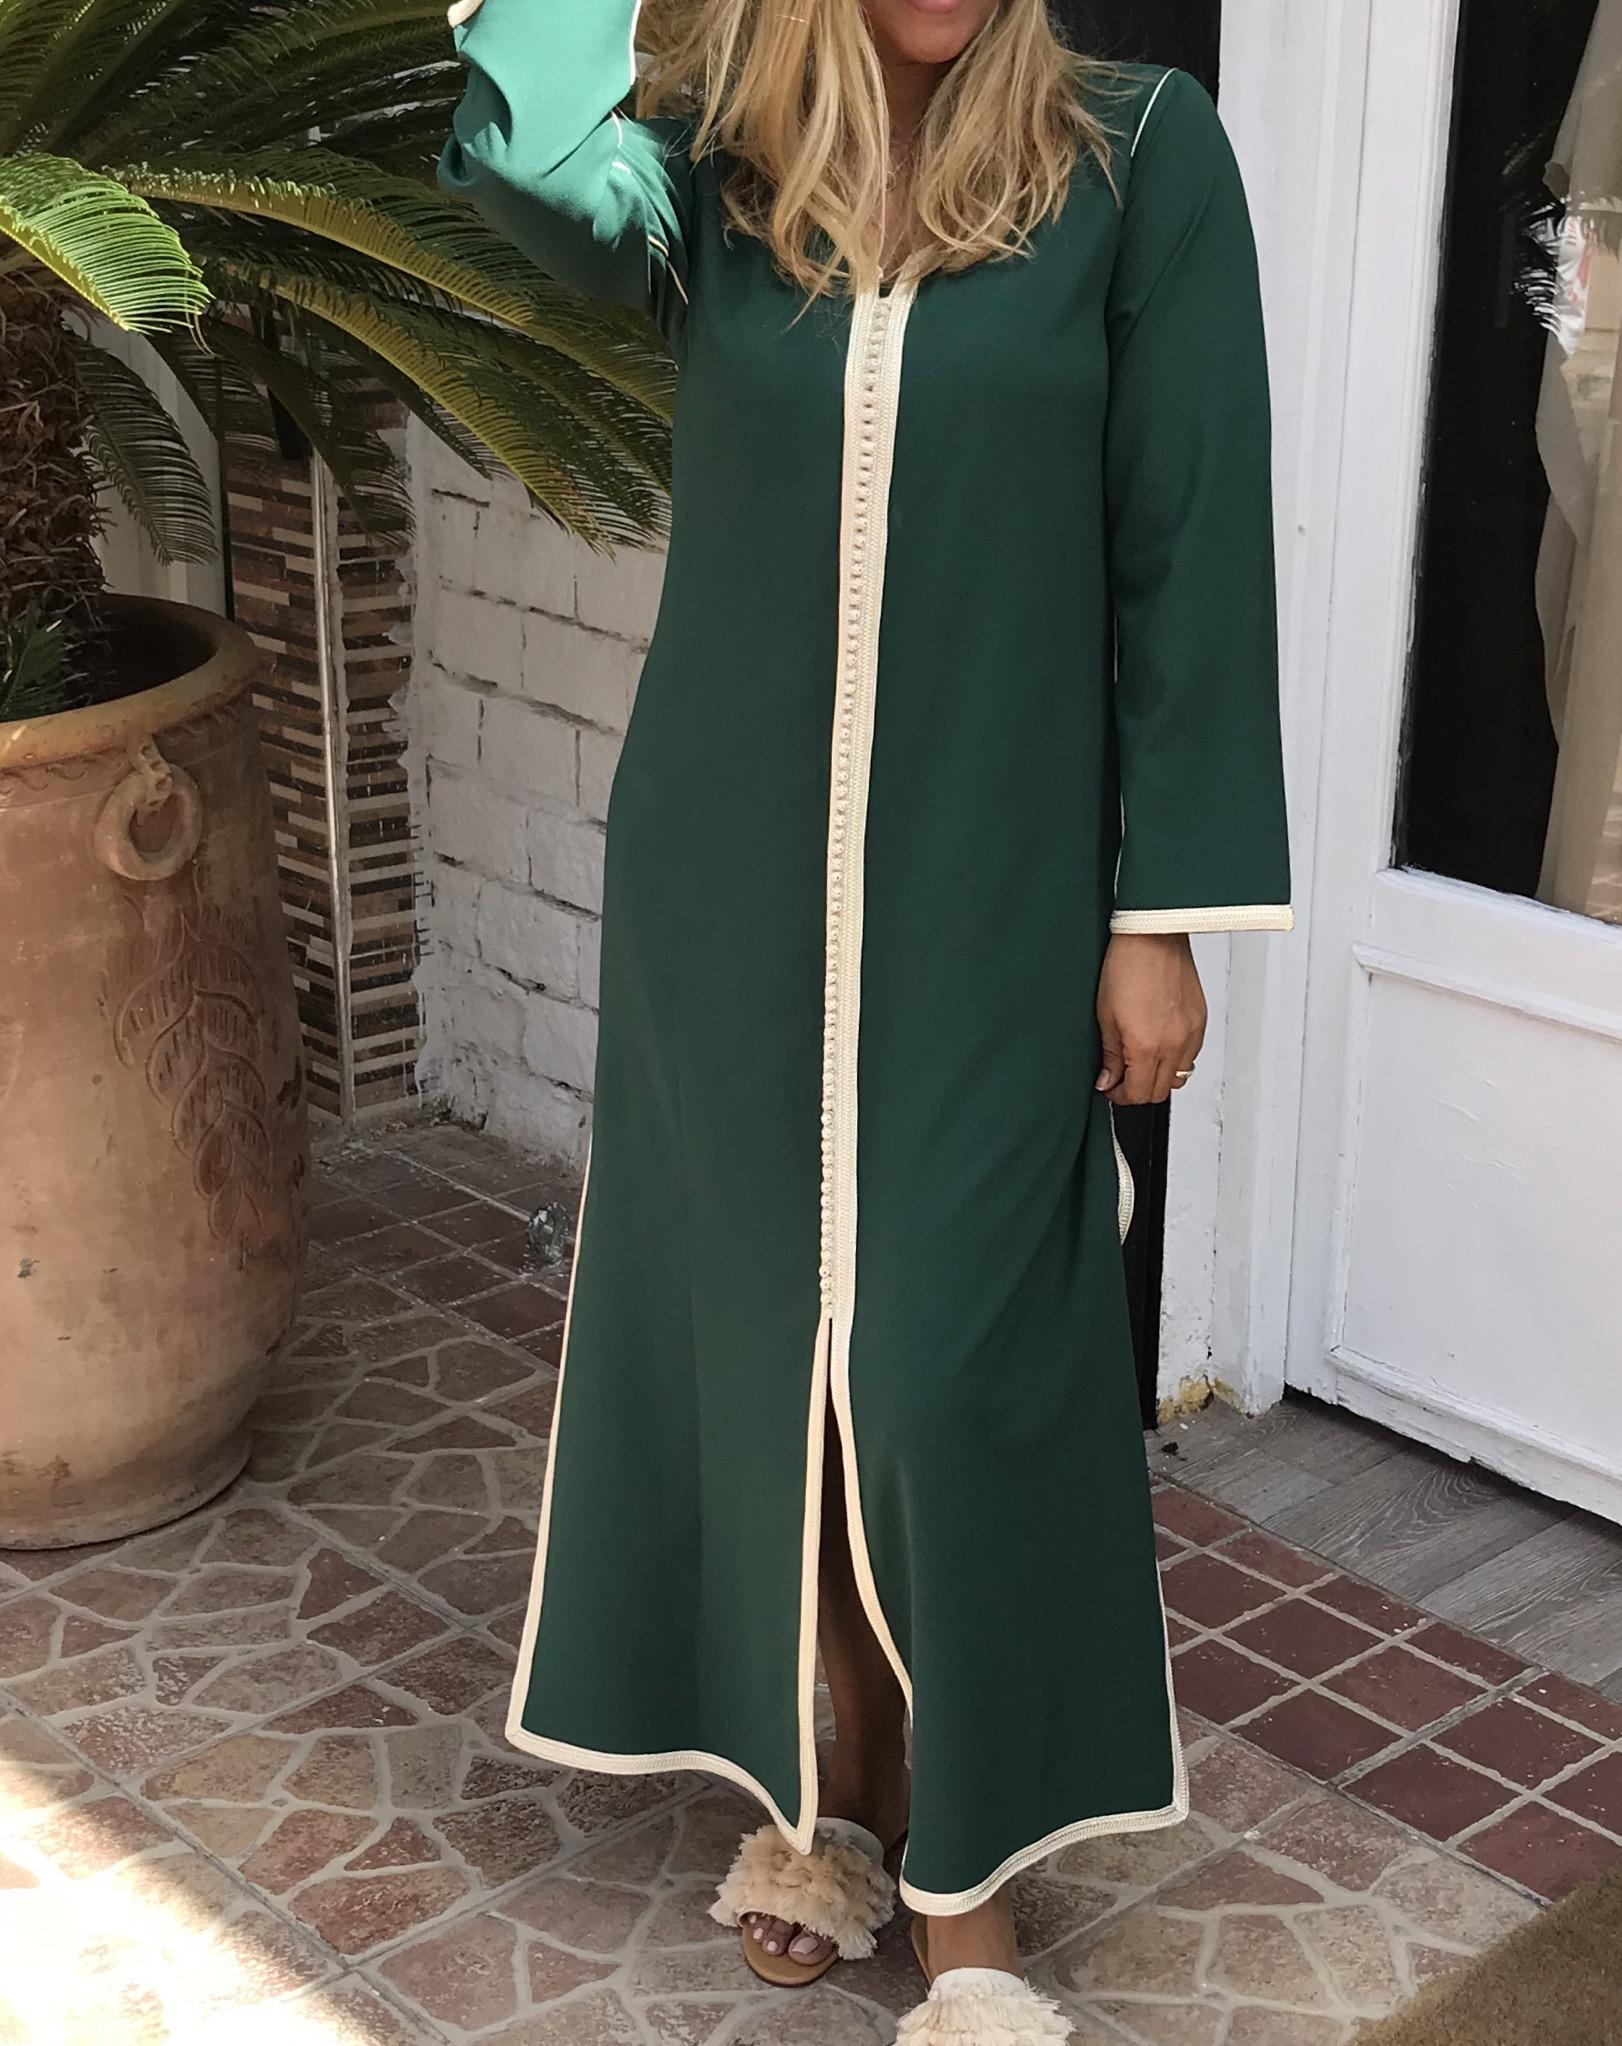 Tunic longue 2pieces green with cream sfifa